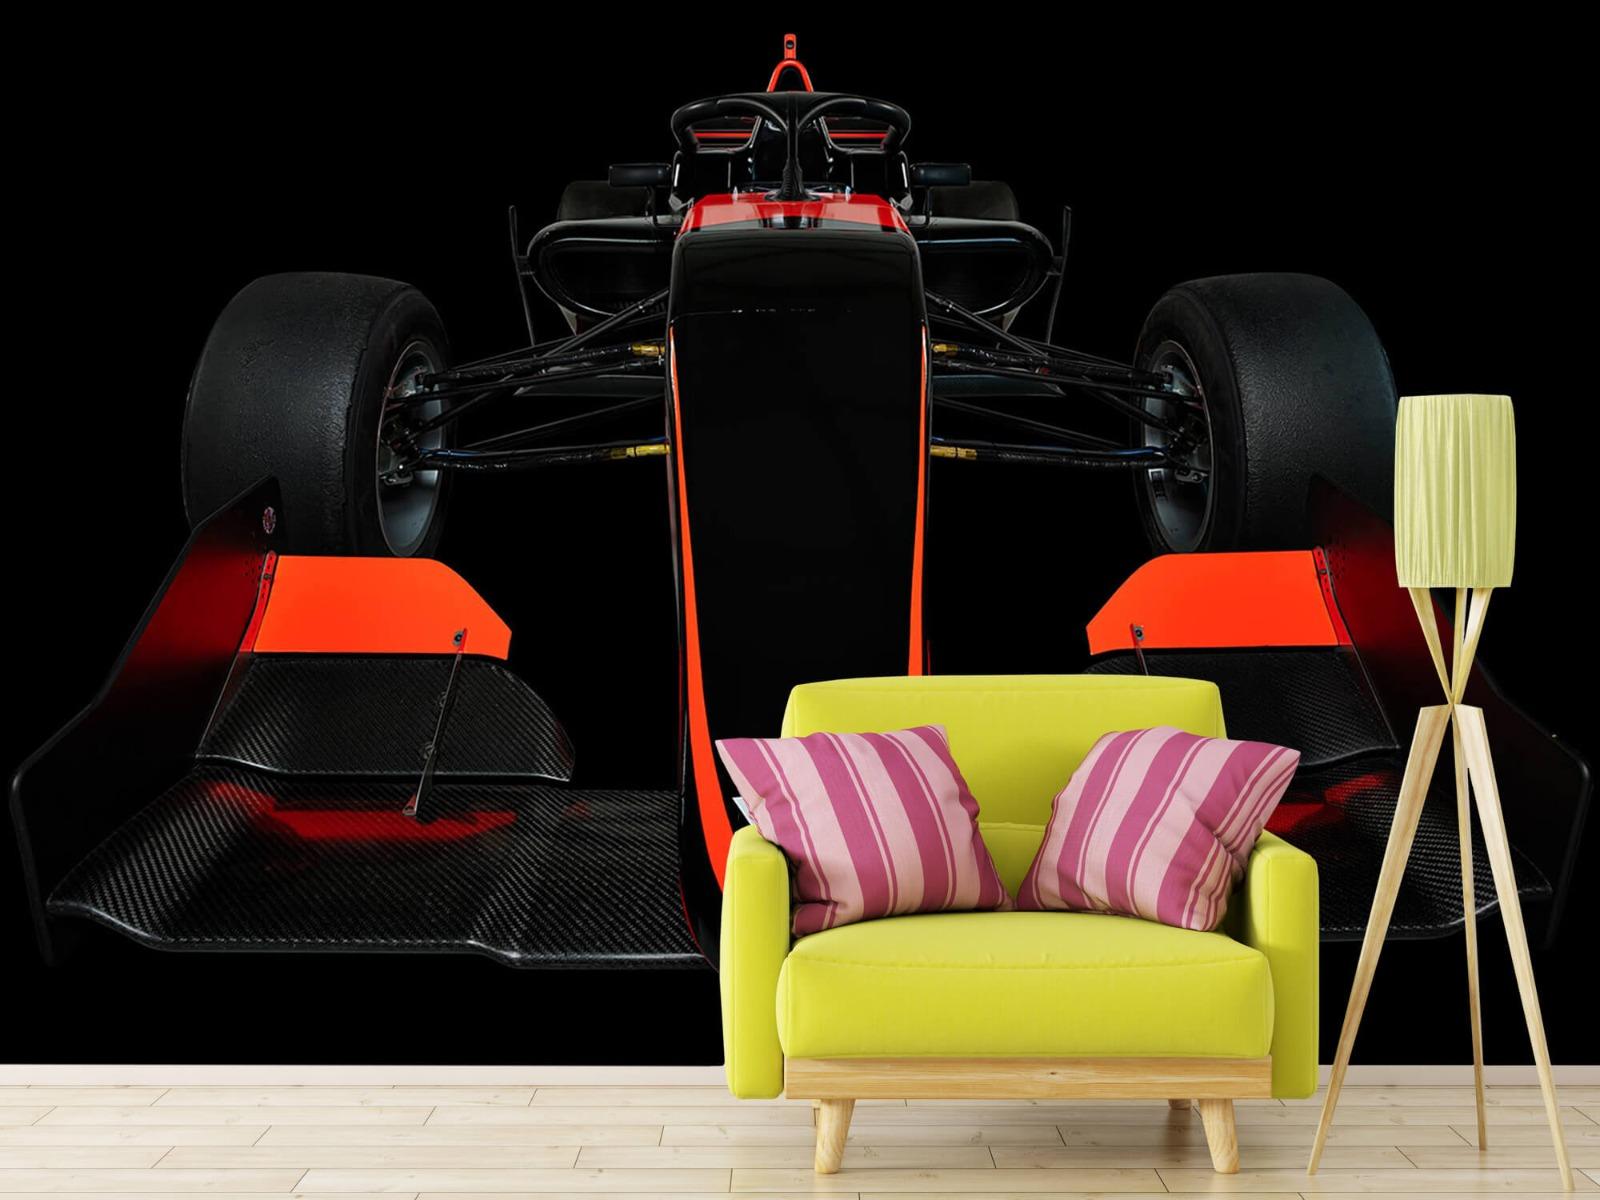 Sportauto's - Formule 3 - Lower front view - dark - Slaapkamer 18